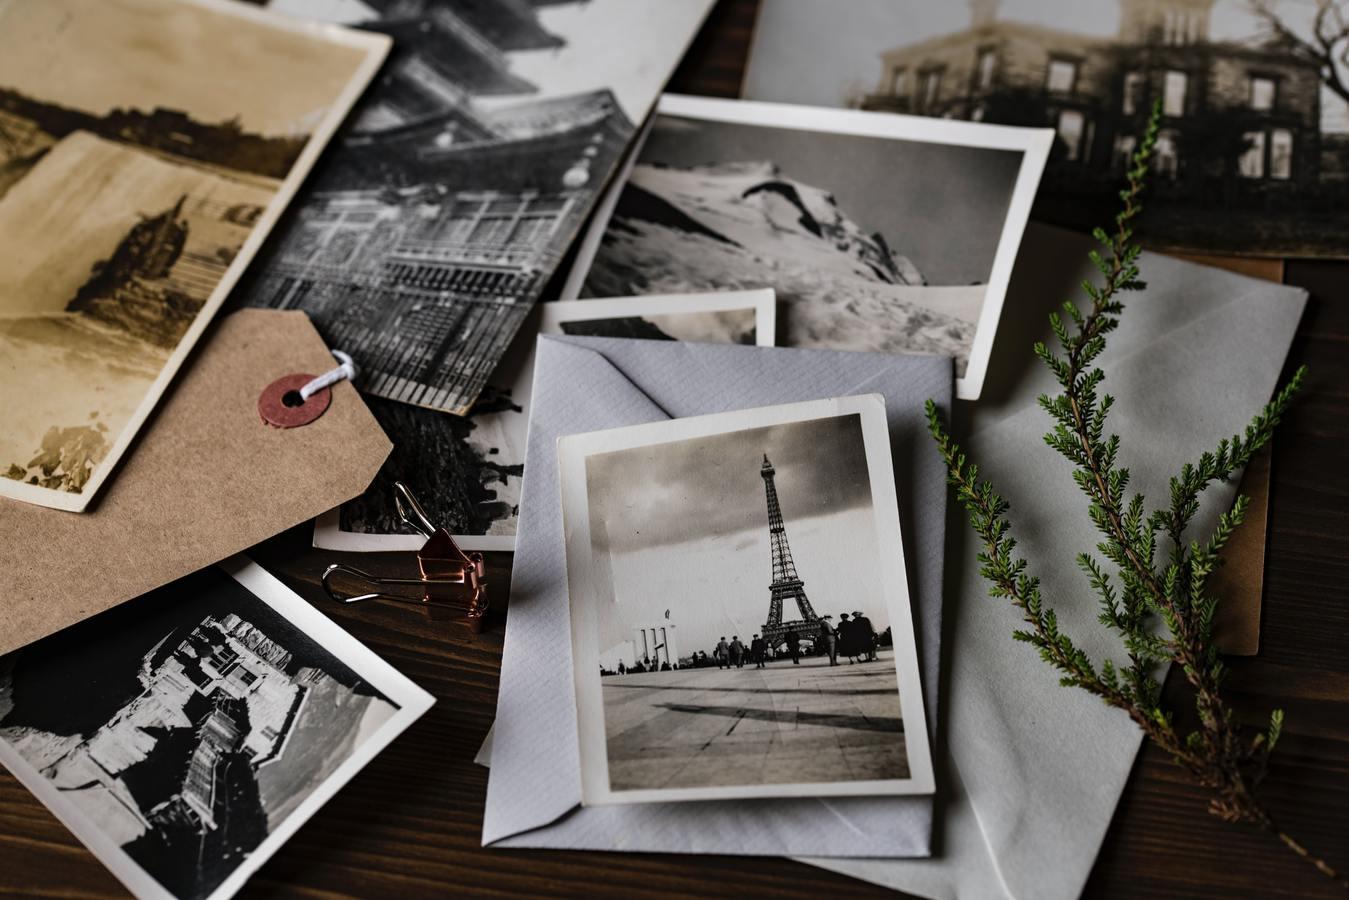 Ansichtkaarten op een tafel